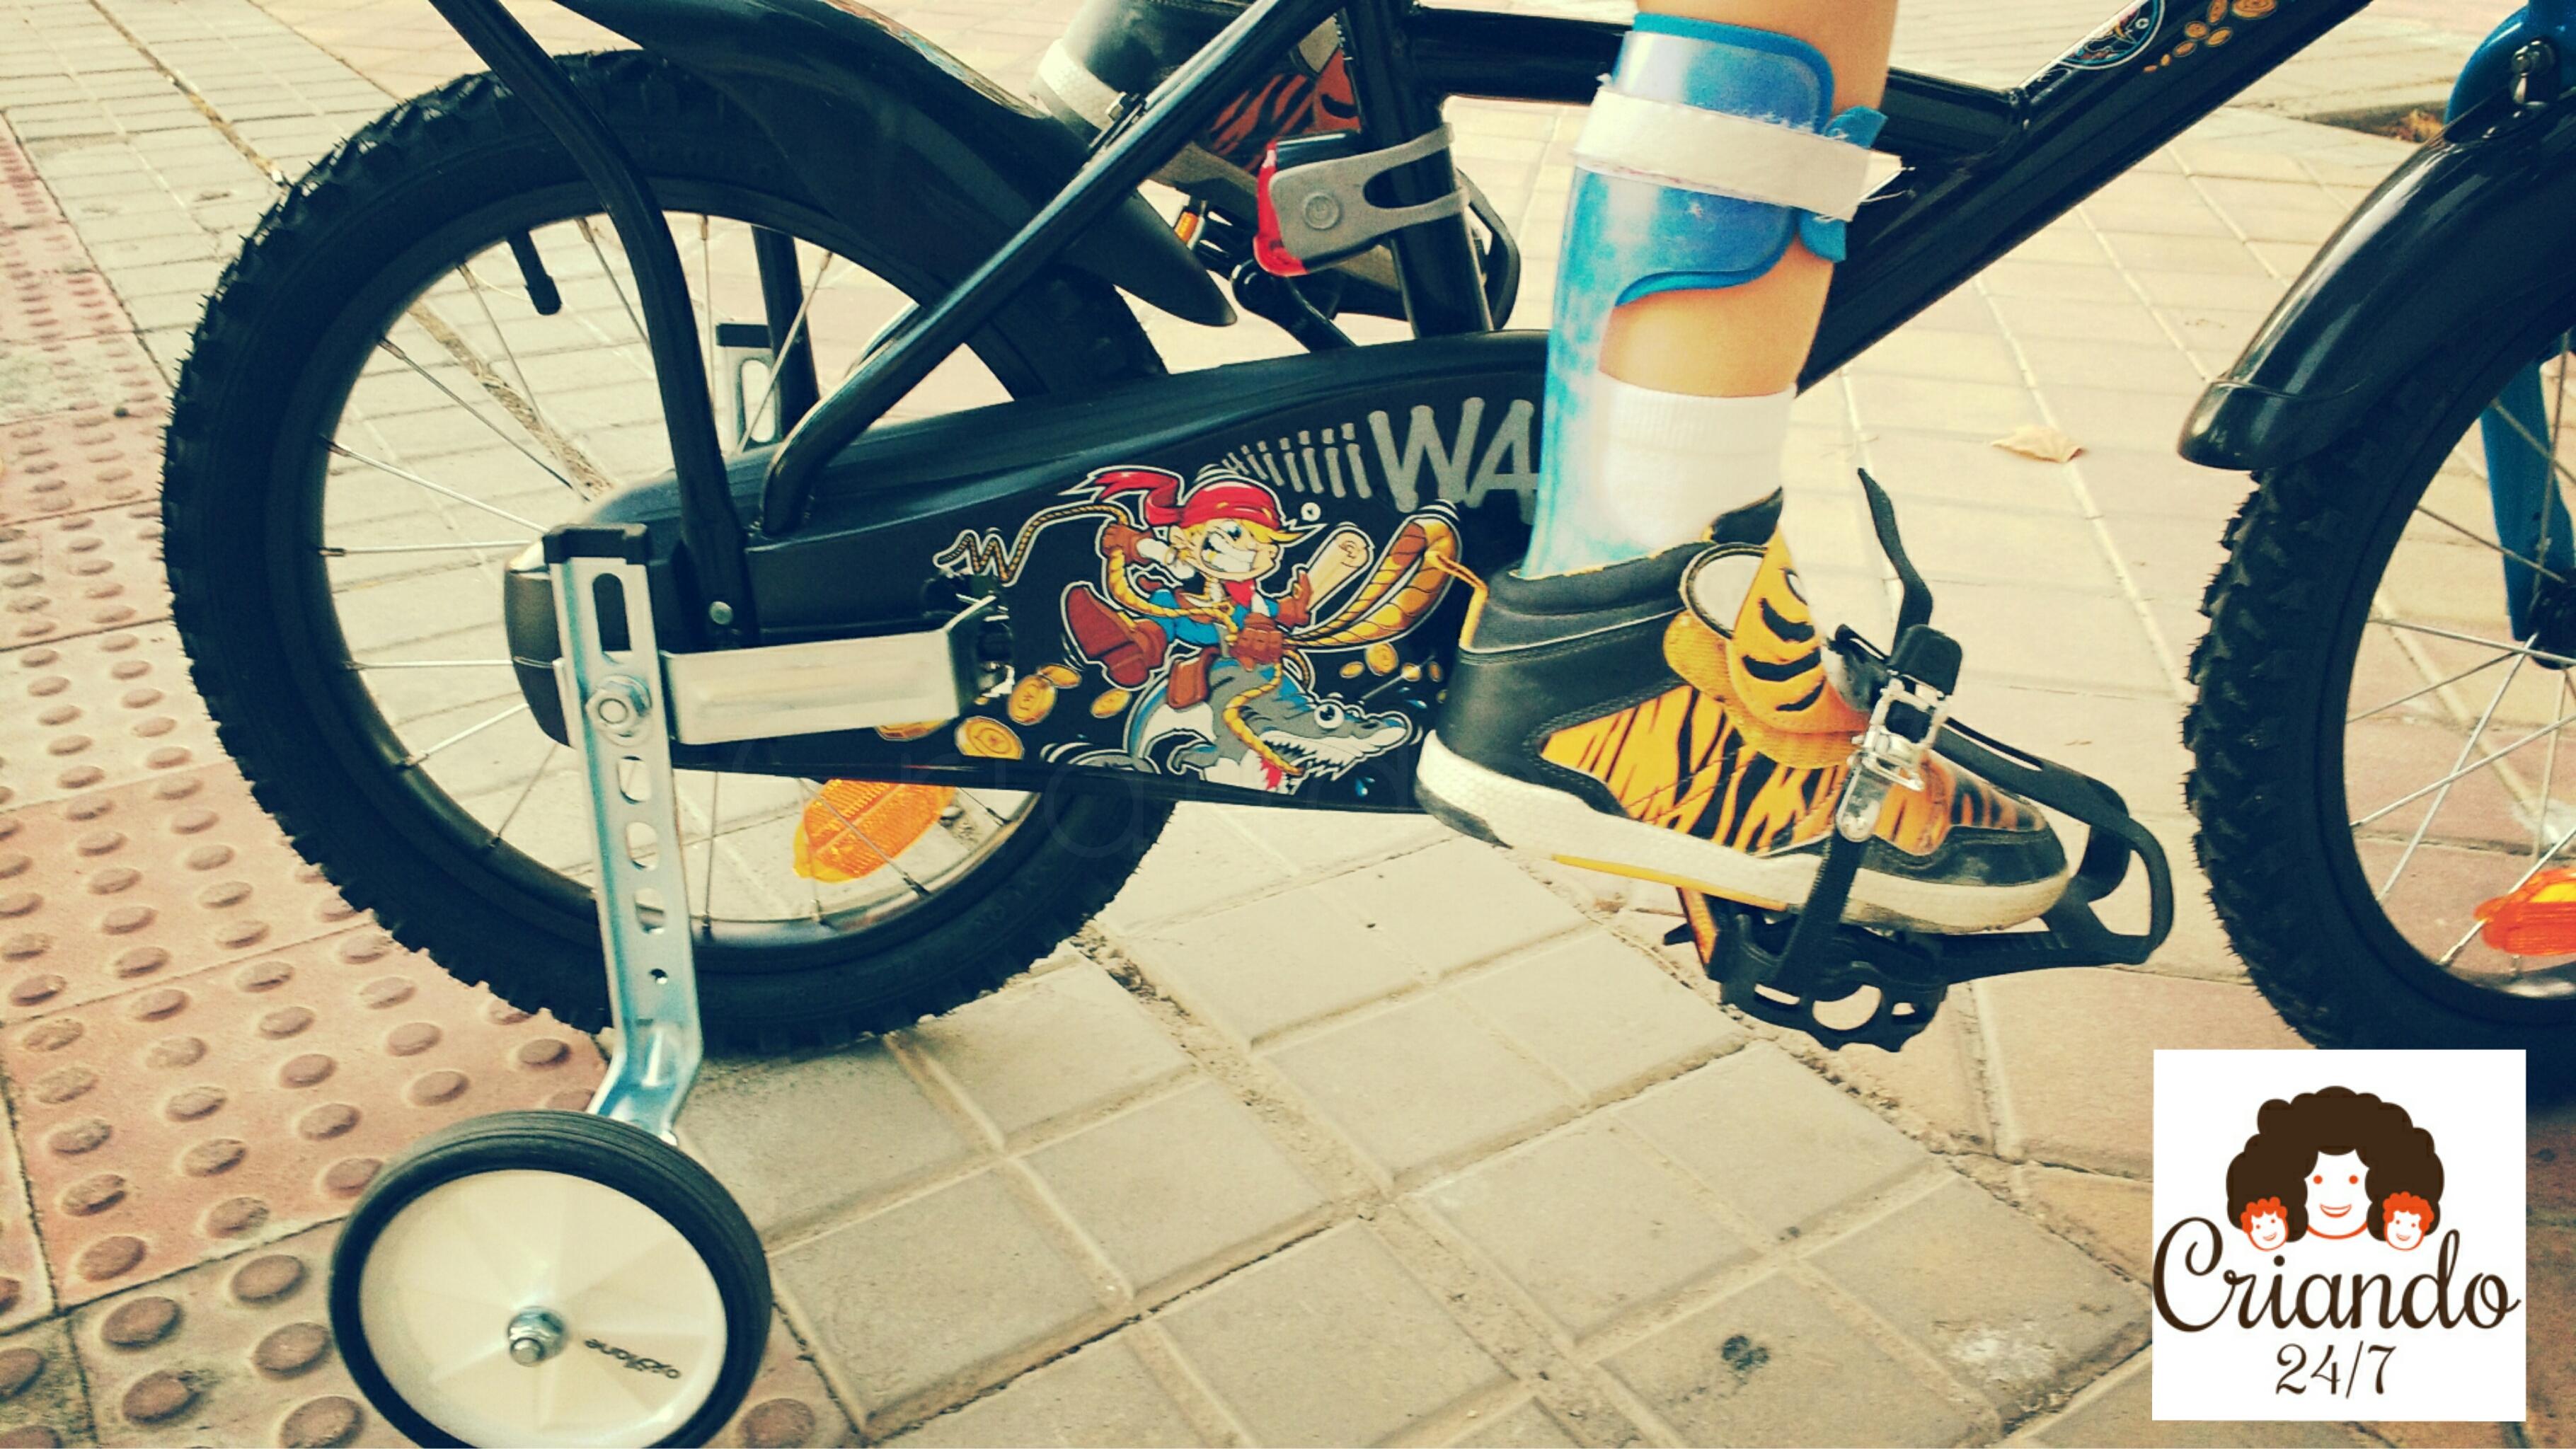 Criando247 bicicleta adaptada hemiparesia pci.jpg